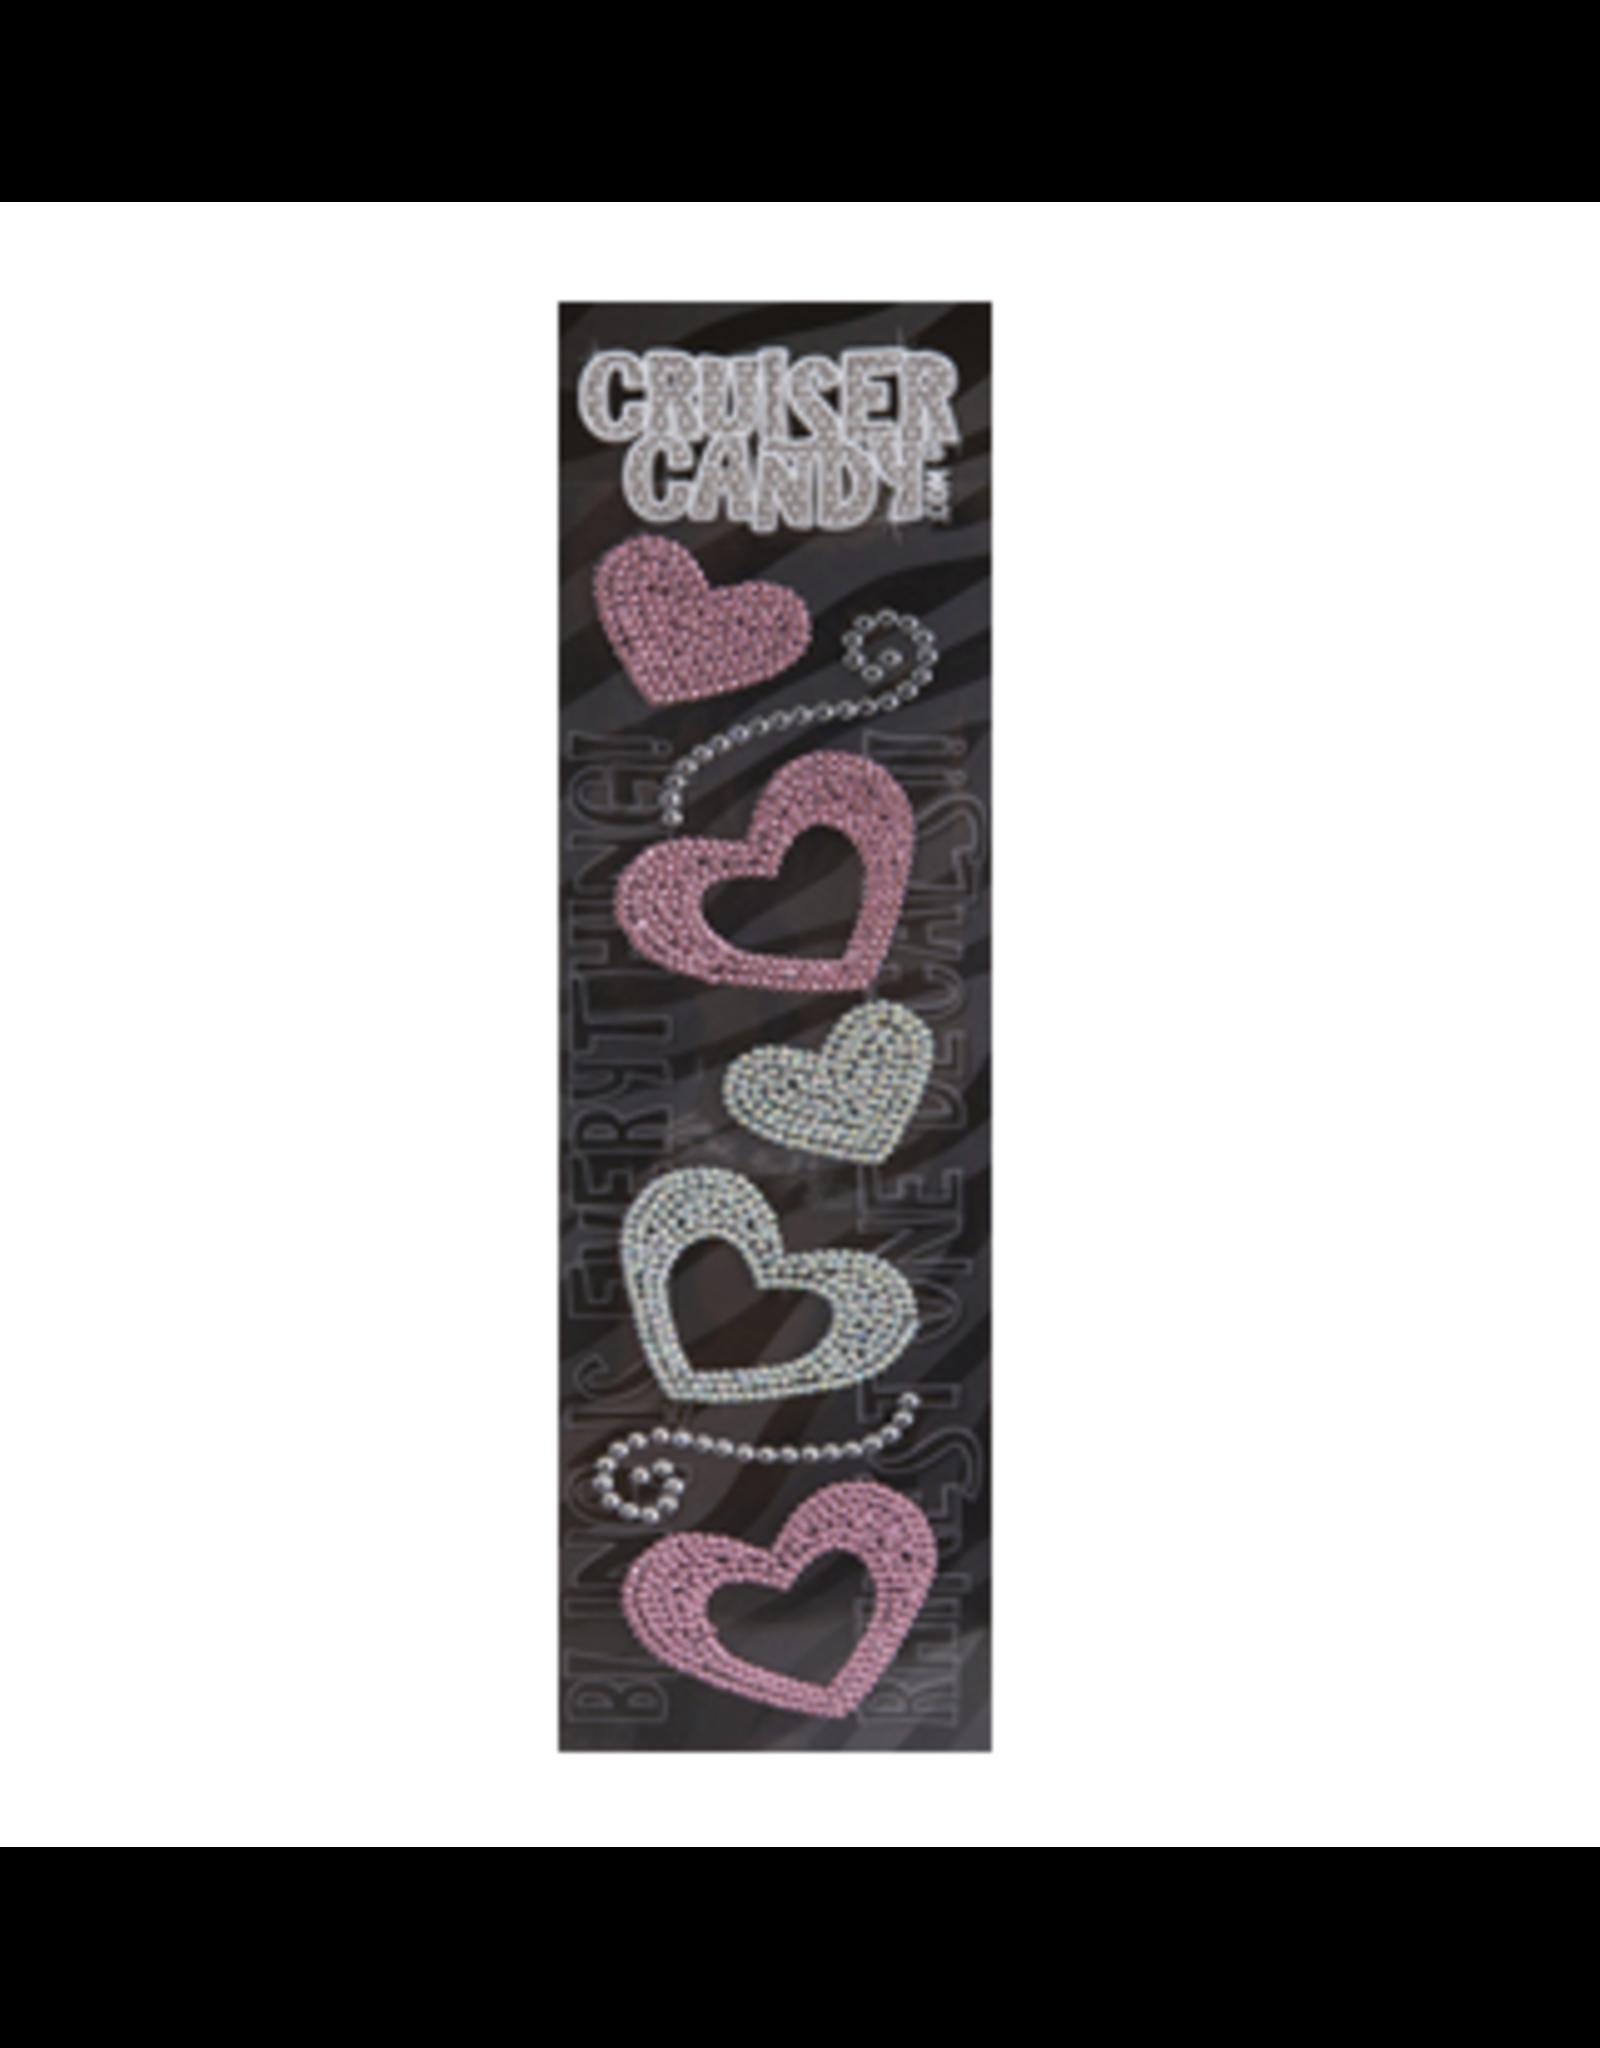 Cruiser Candy Heart Rhinestone Decals